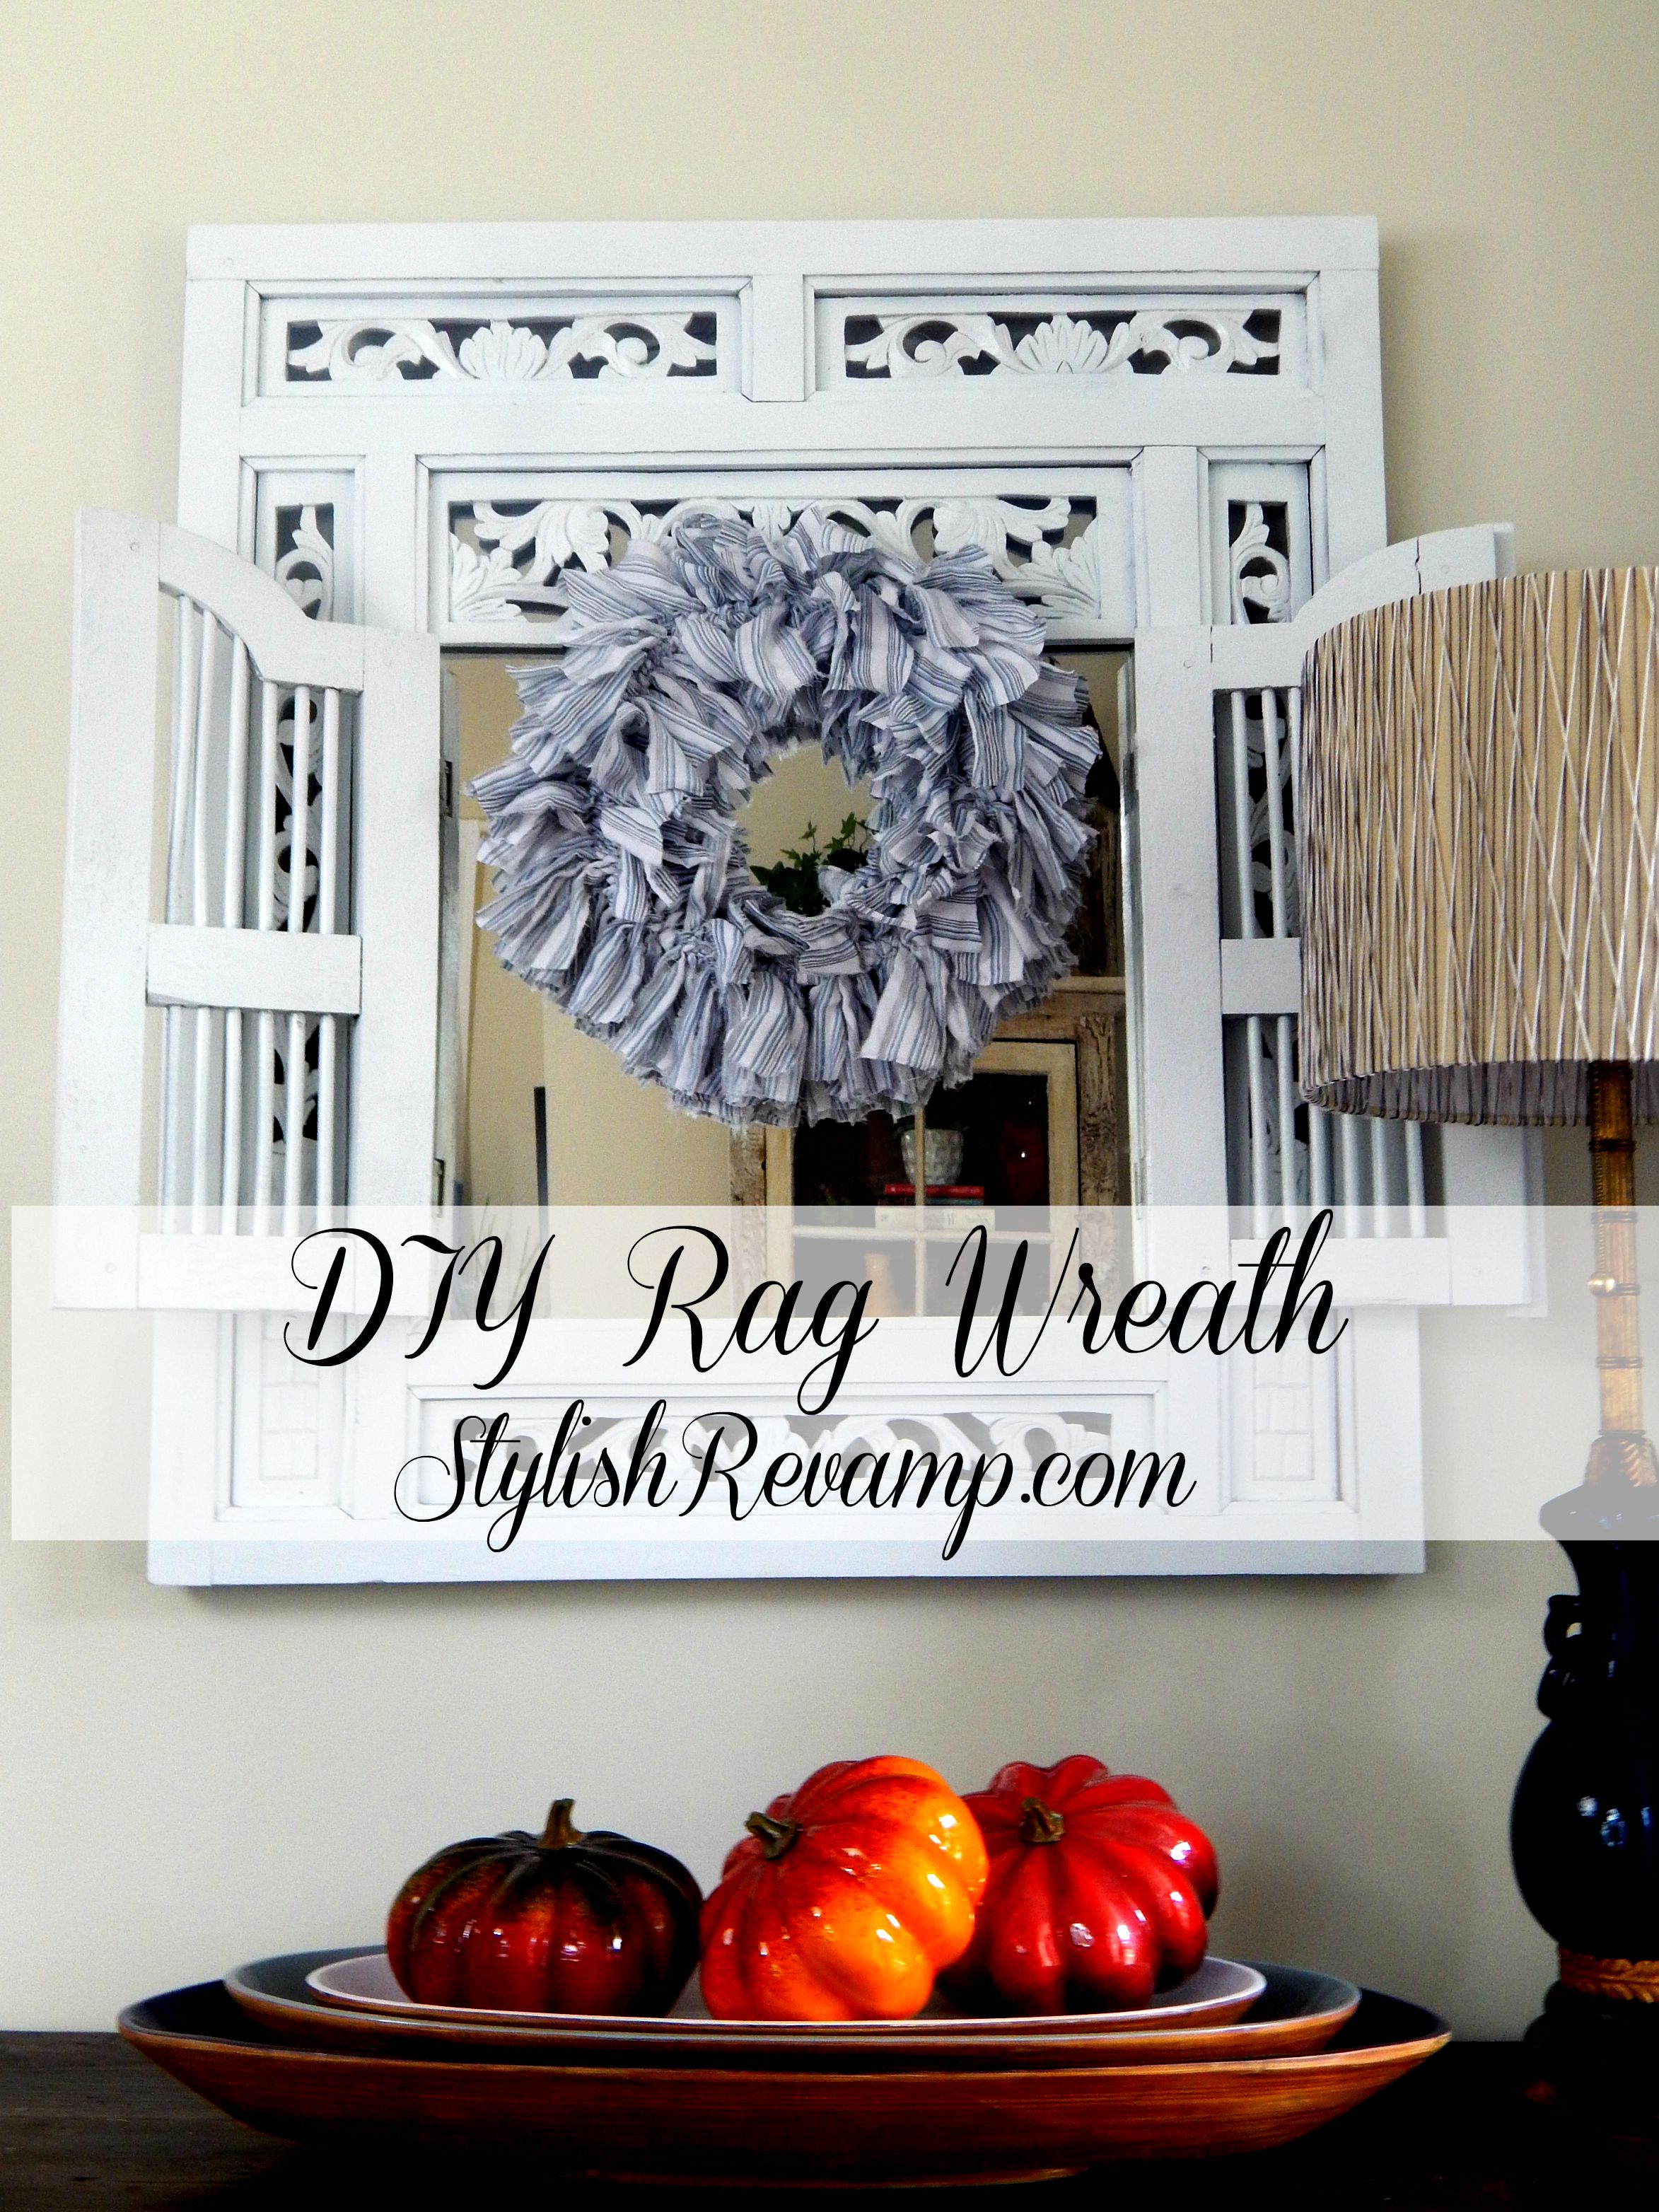 Diy Rag Wreath Stylish Revamp